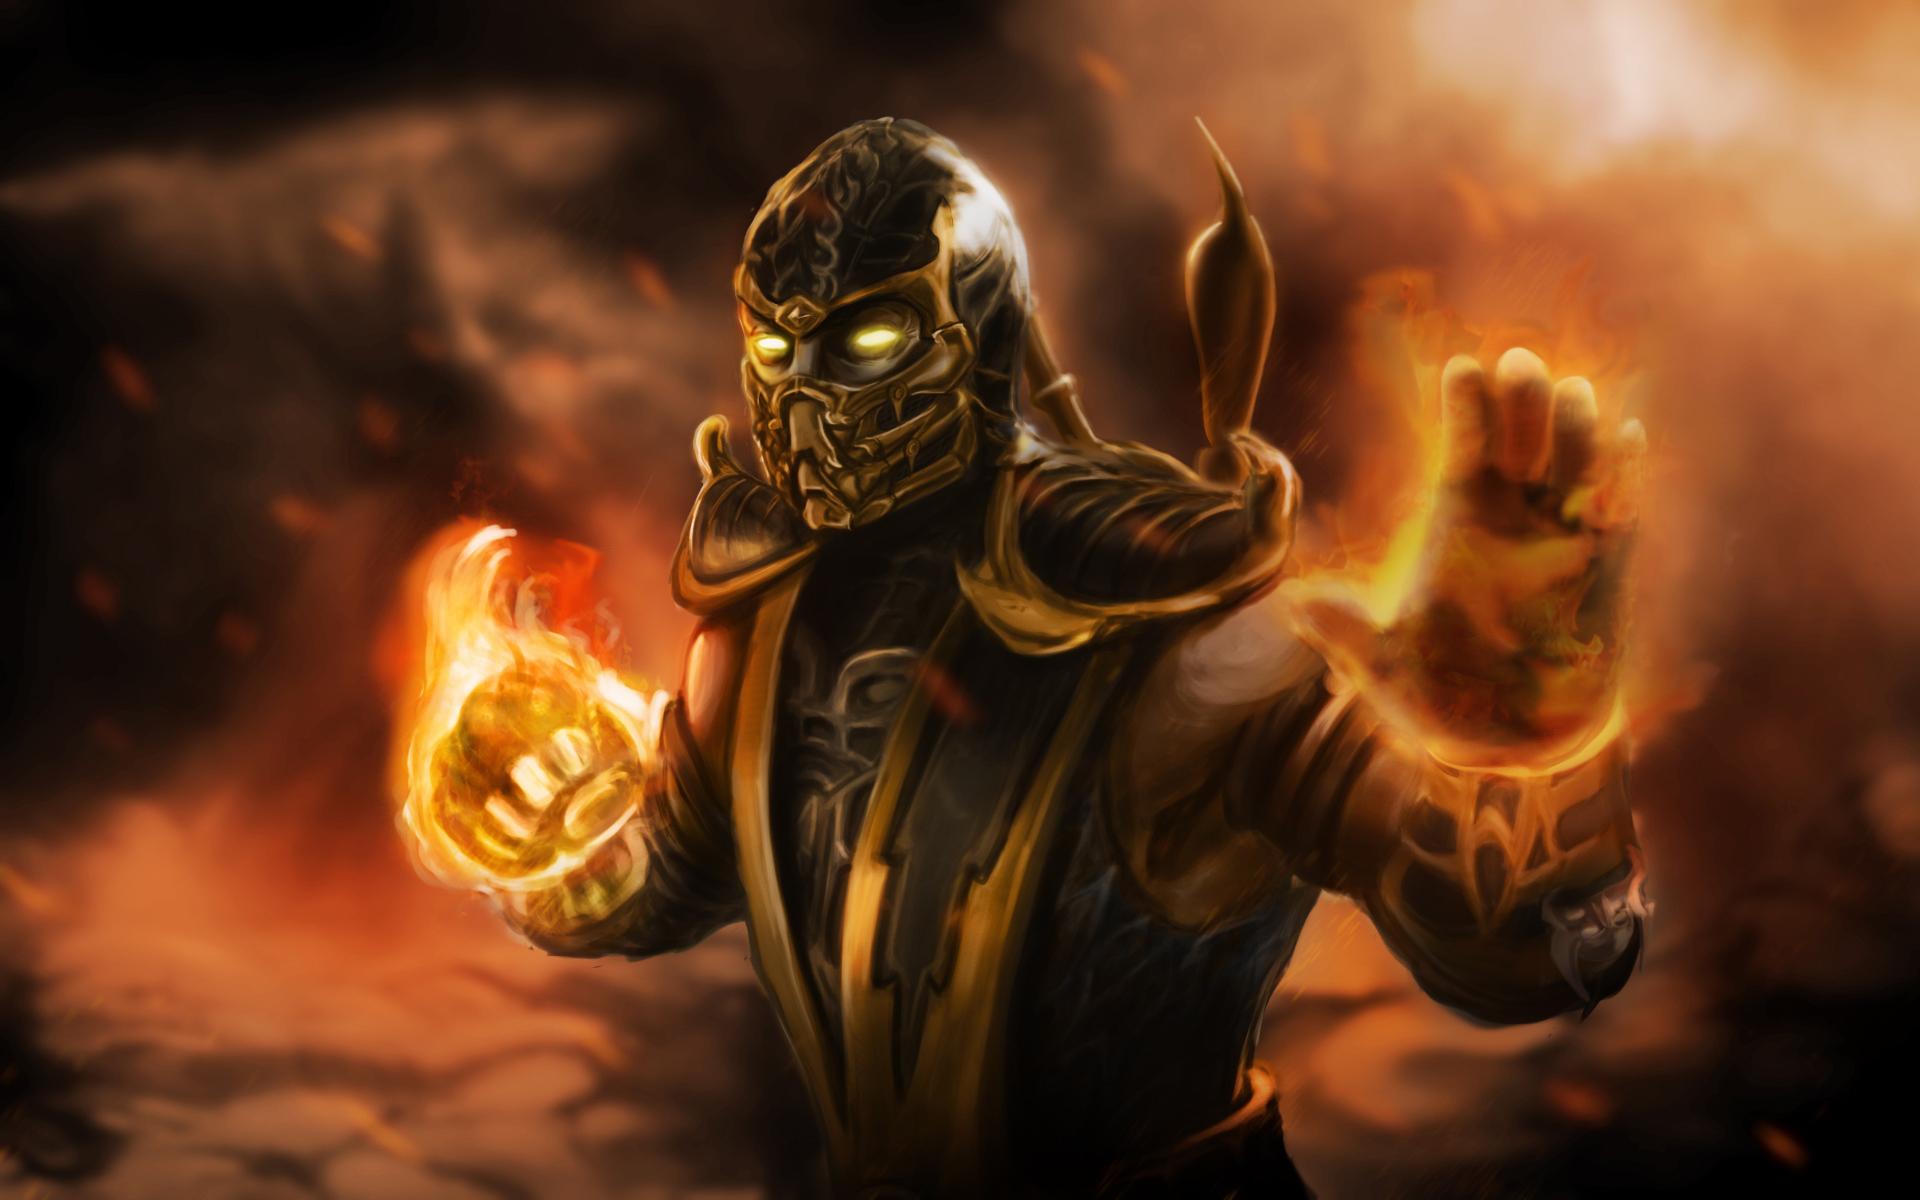 Scorpion Mortal Kombat 32729 1920x1200px